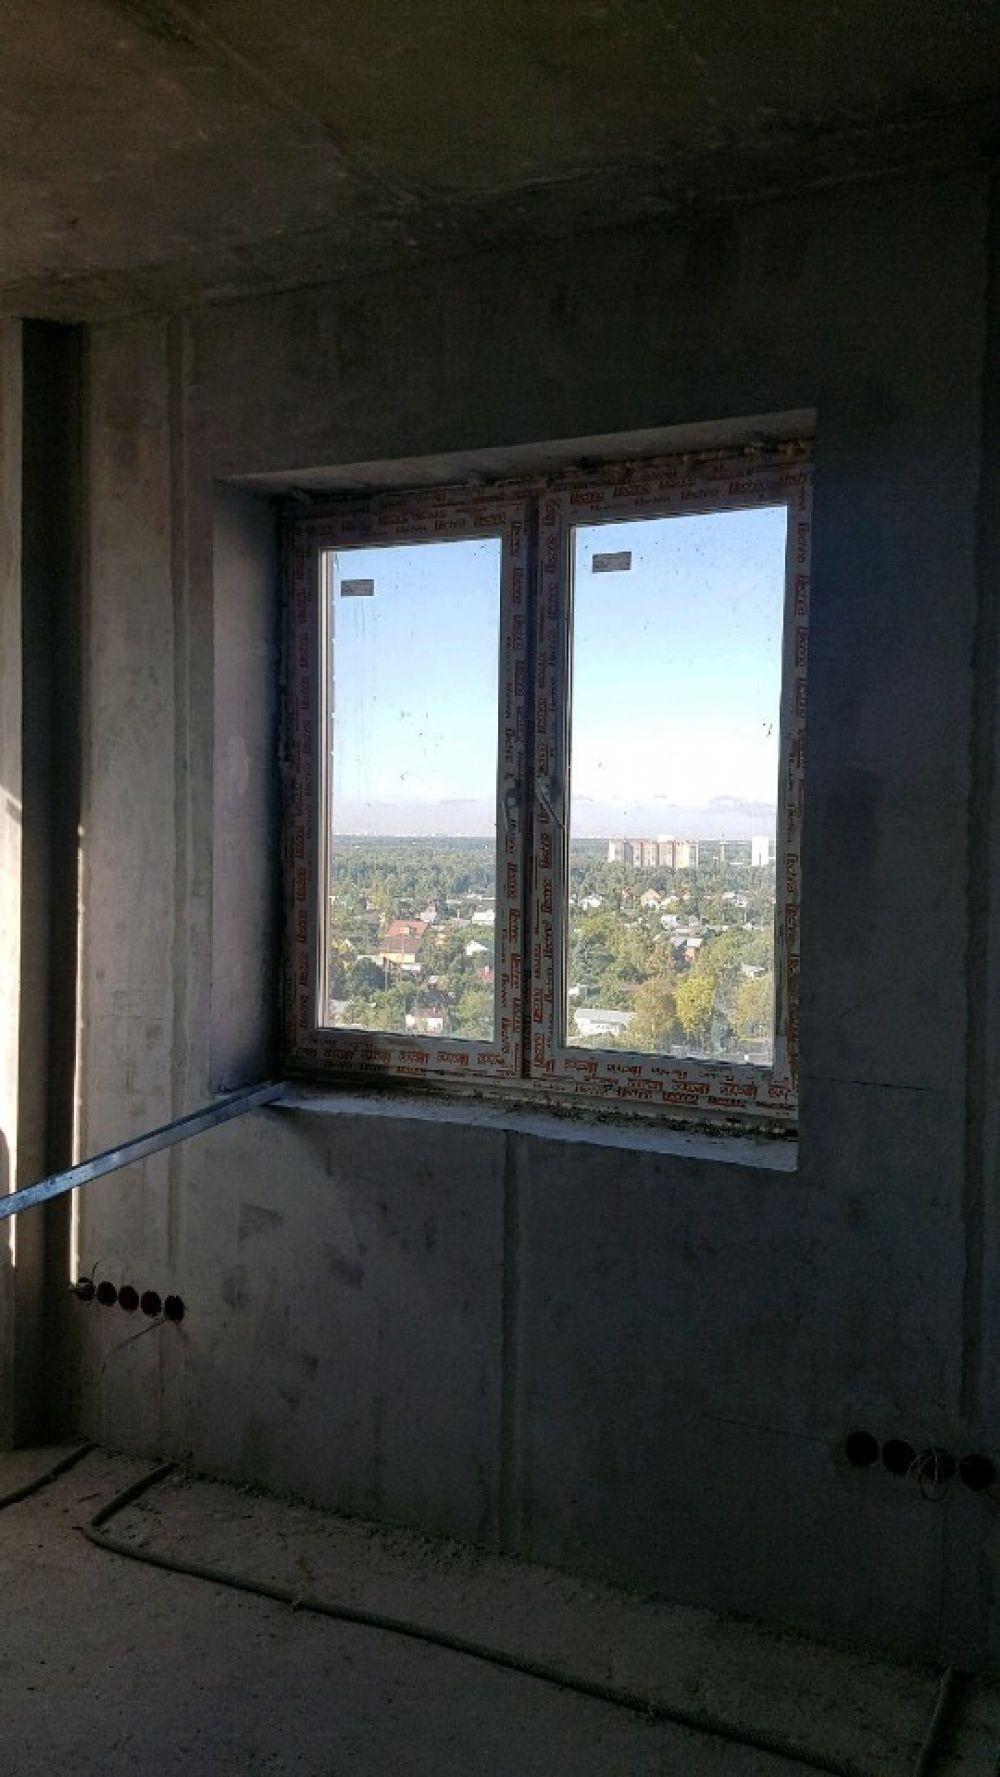 2-к квартира, Щелково, микрорайон Богородский, 22, фото 10